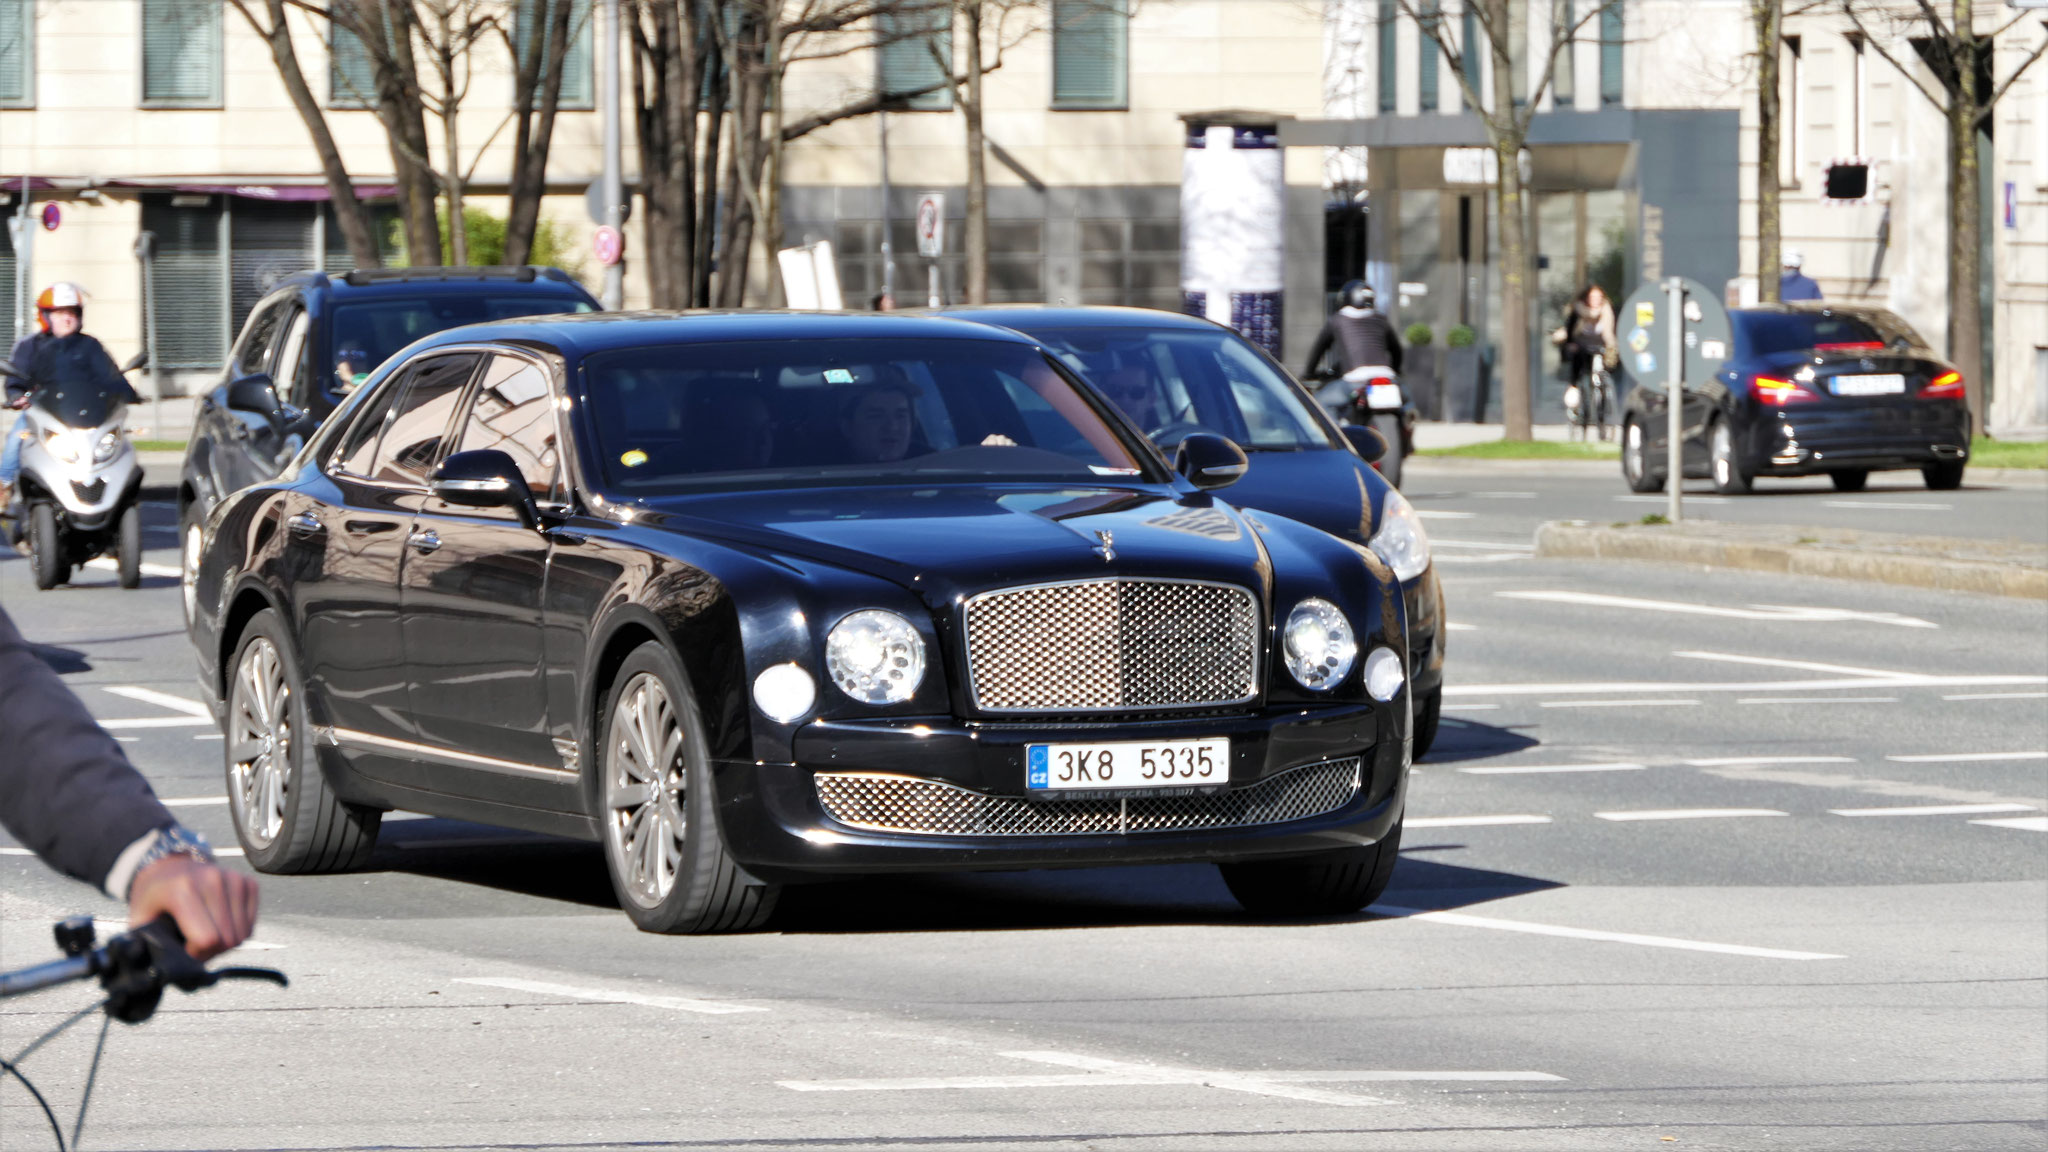 Bentley Mulsanne - 3K8-5335 (CZ)